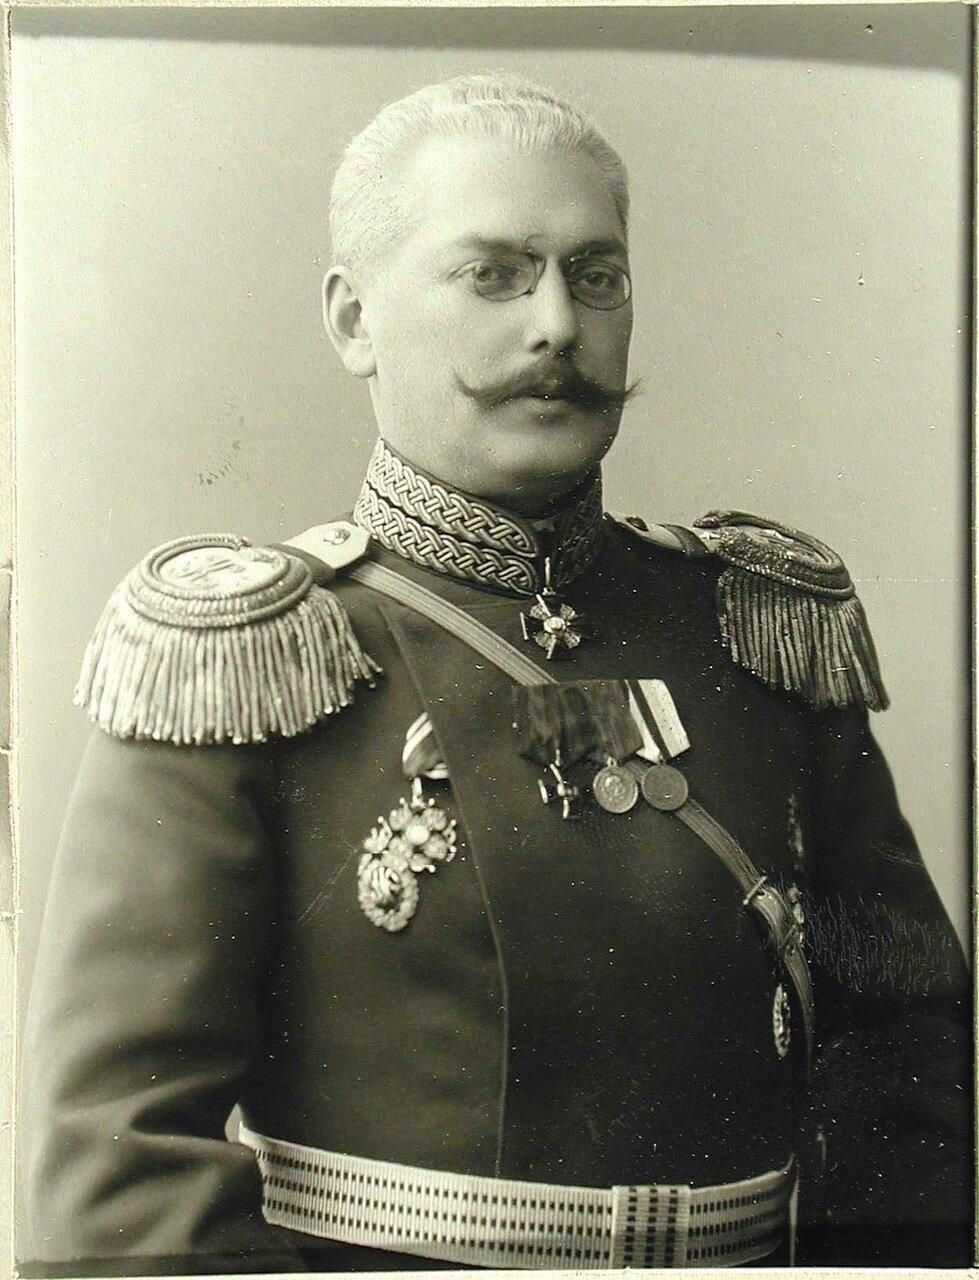 27. Дуплицкий Константин Дмитриевич - подполковник, квартирмейстер училища